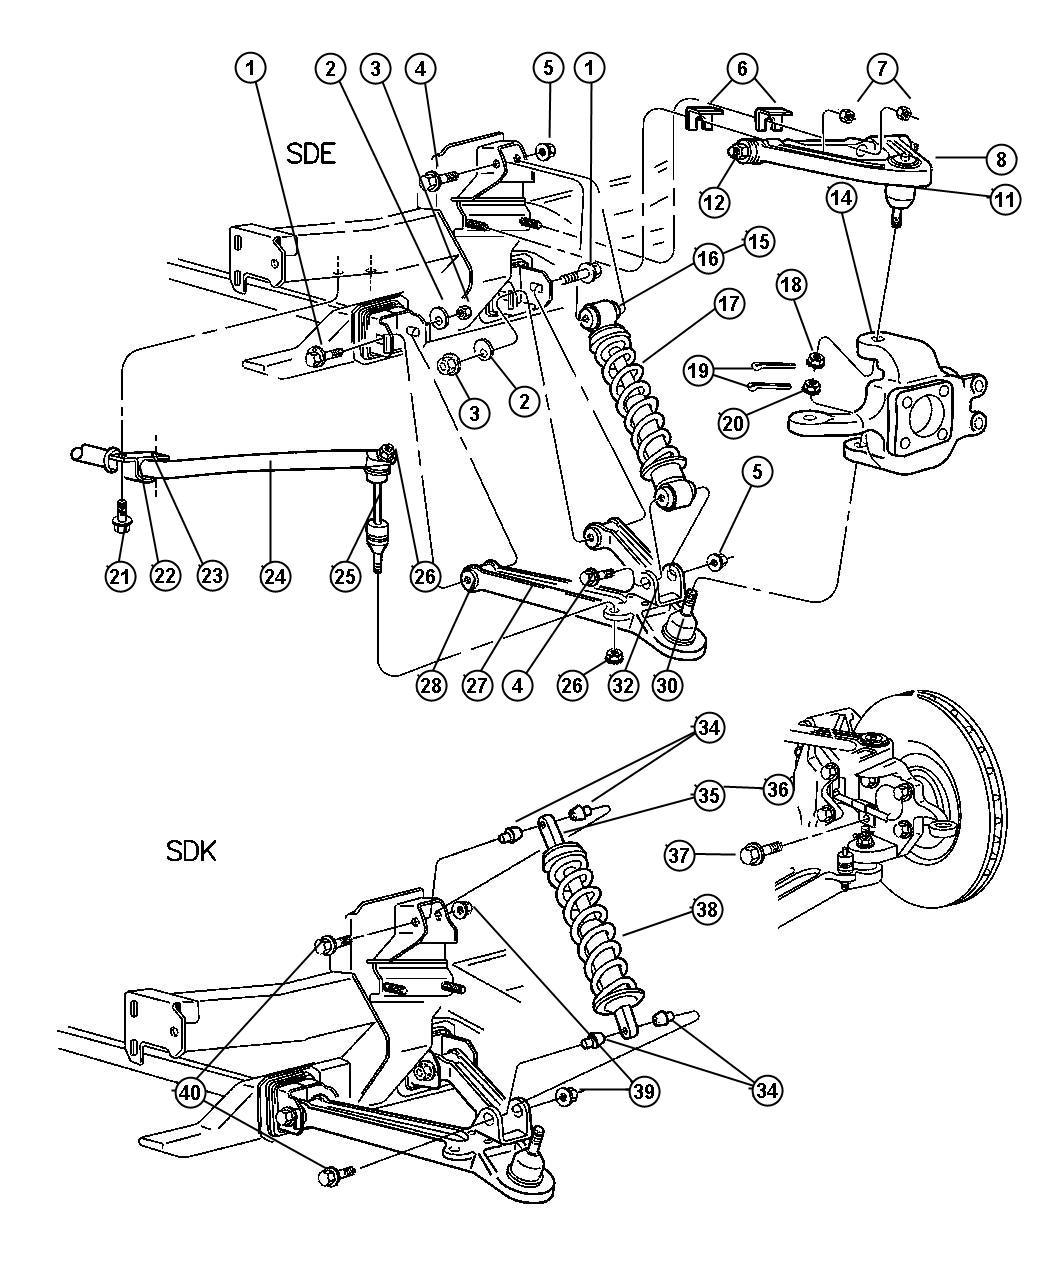 Dodge Viper Shock absorber. Suspension. Front. Right